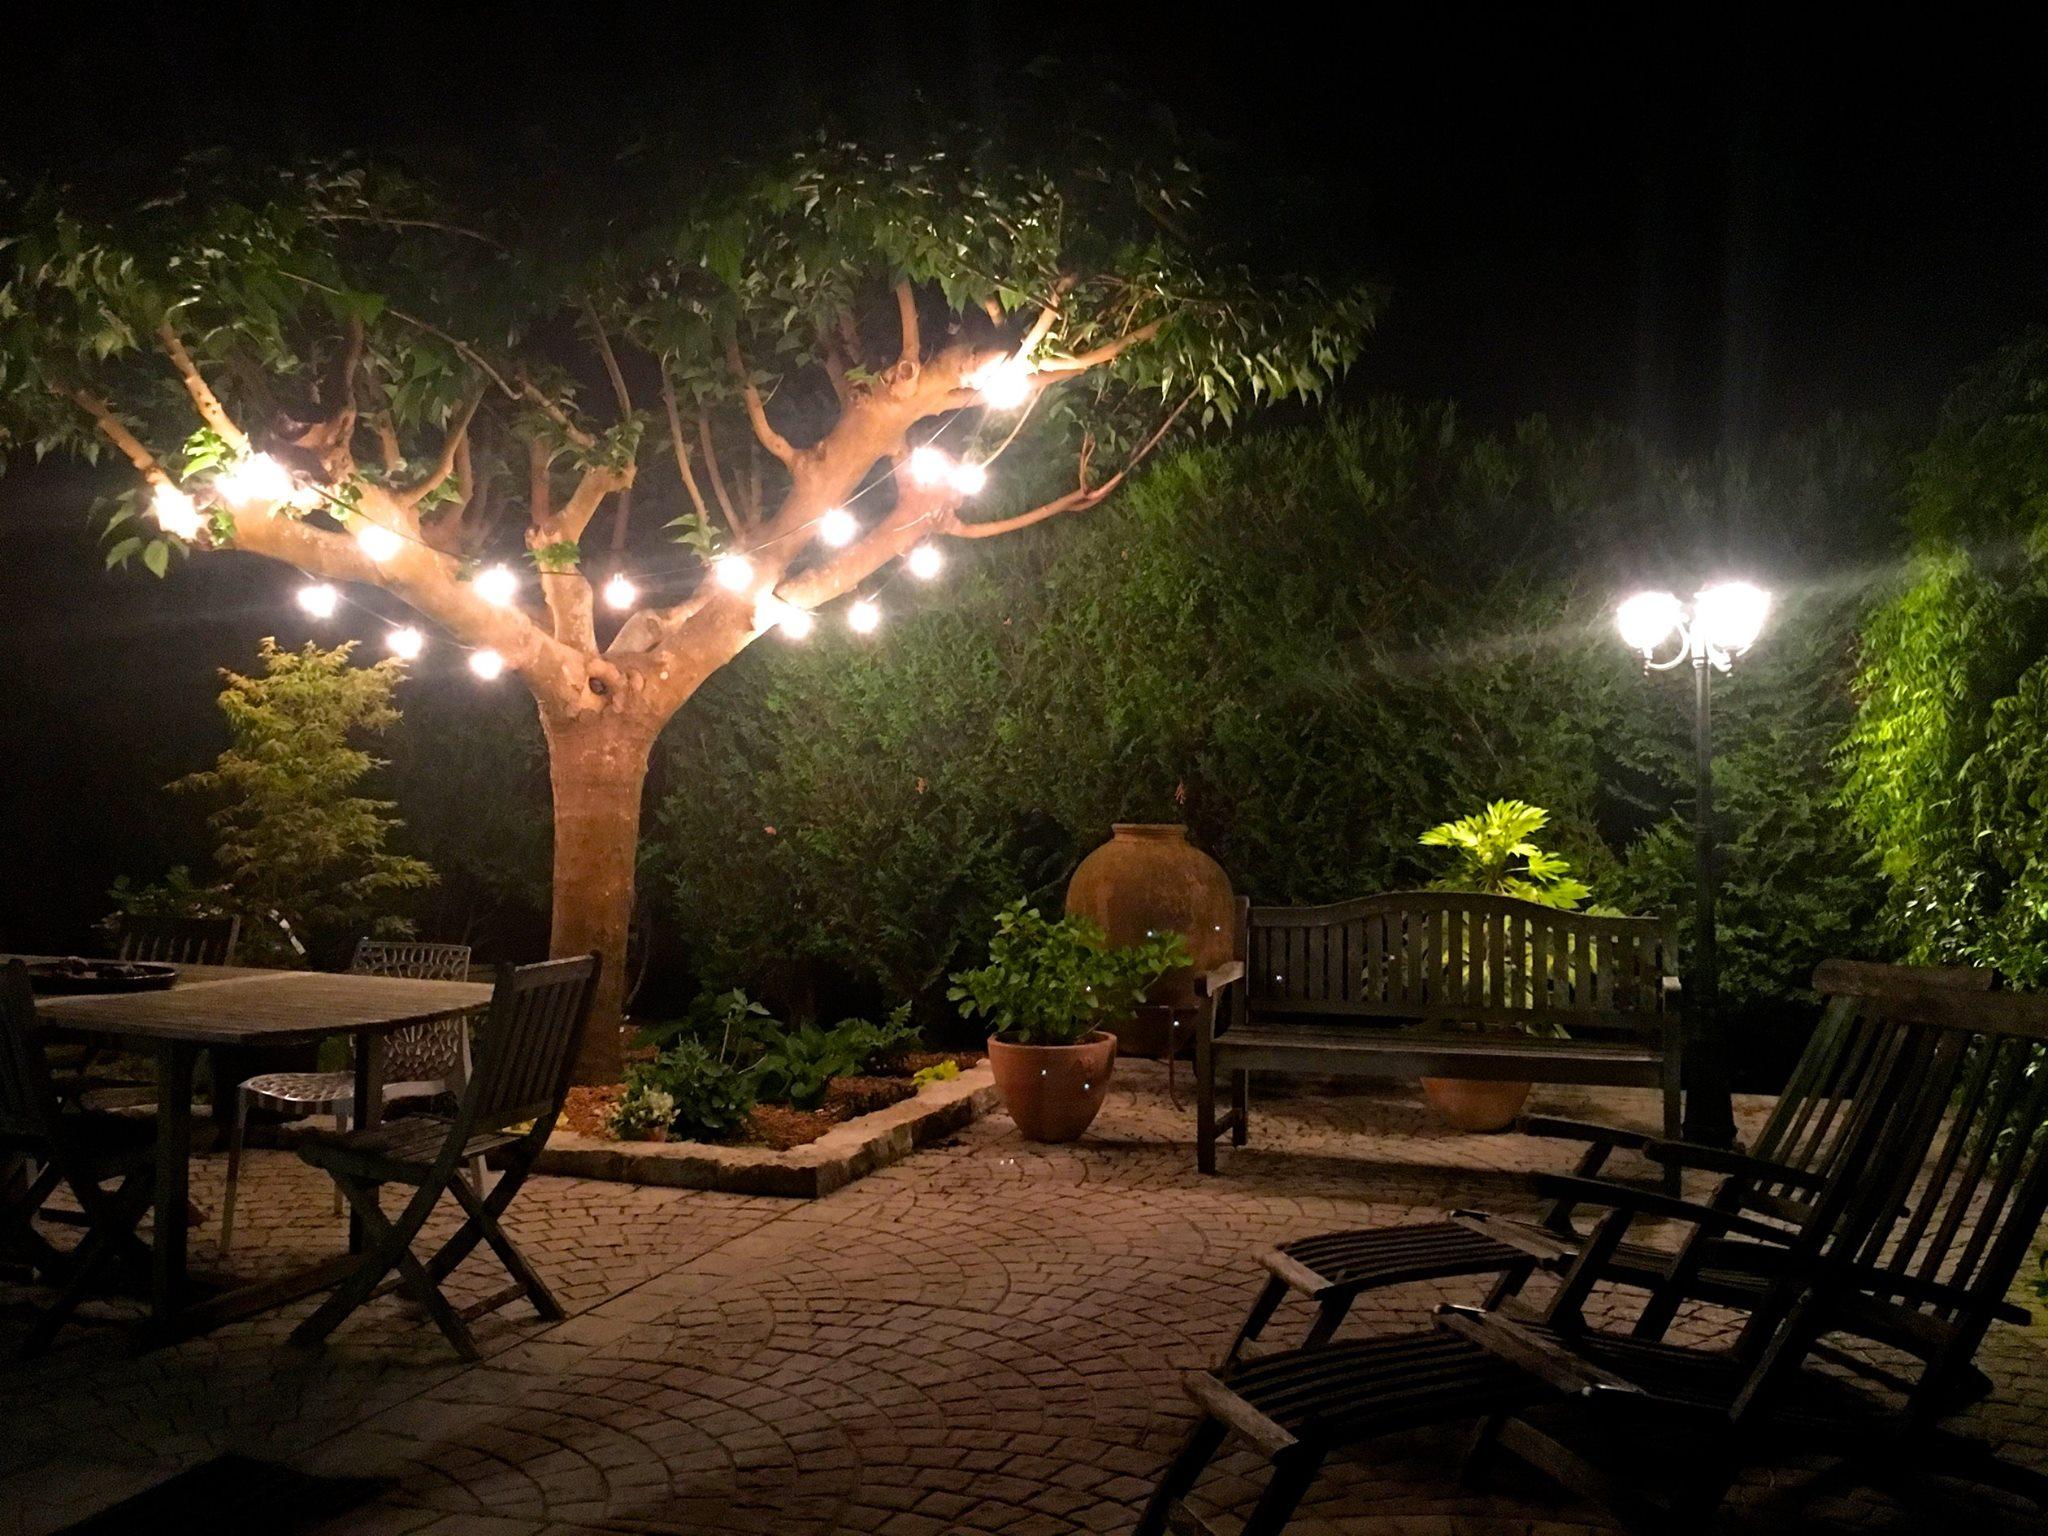 best eclairage jardin fete photos design trends 2017. Black Bedroom Furniture Sets. Home Design Ideas